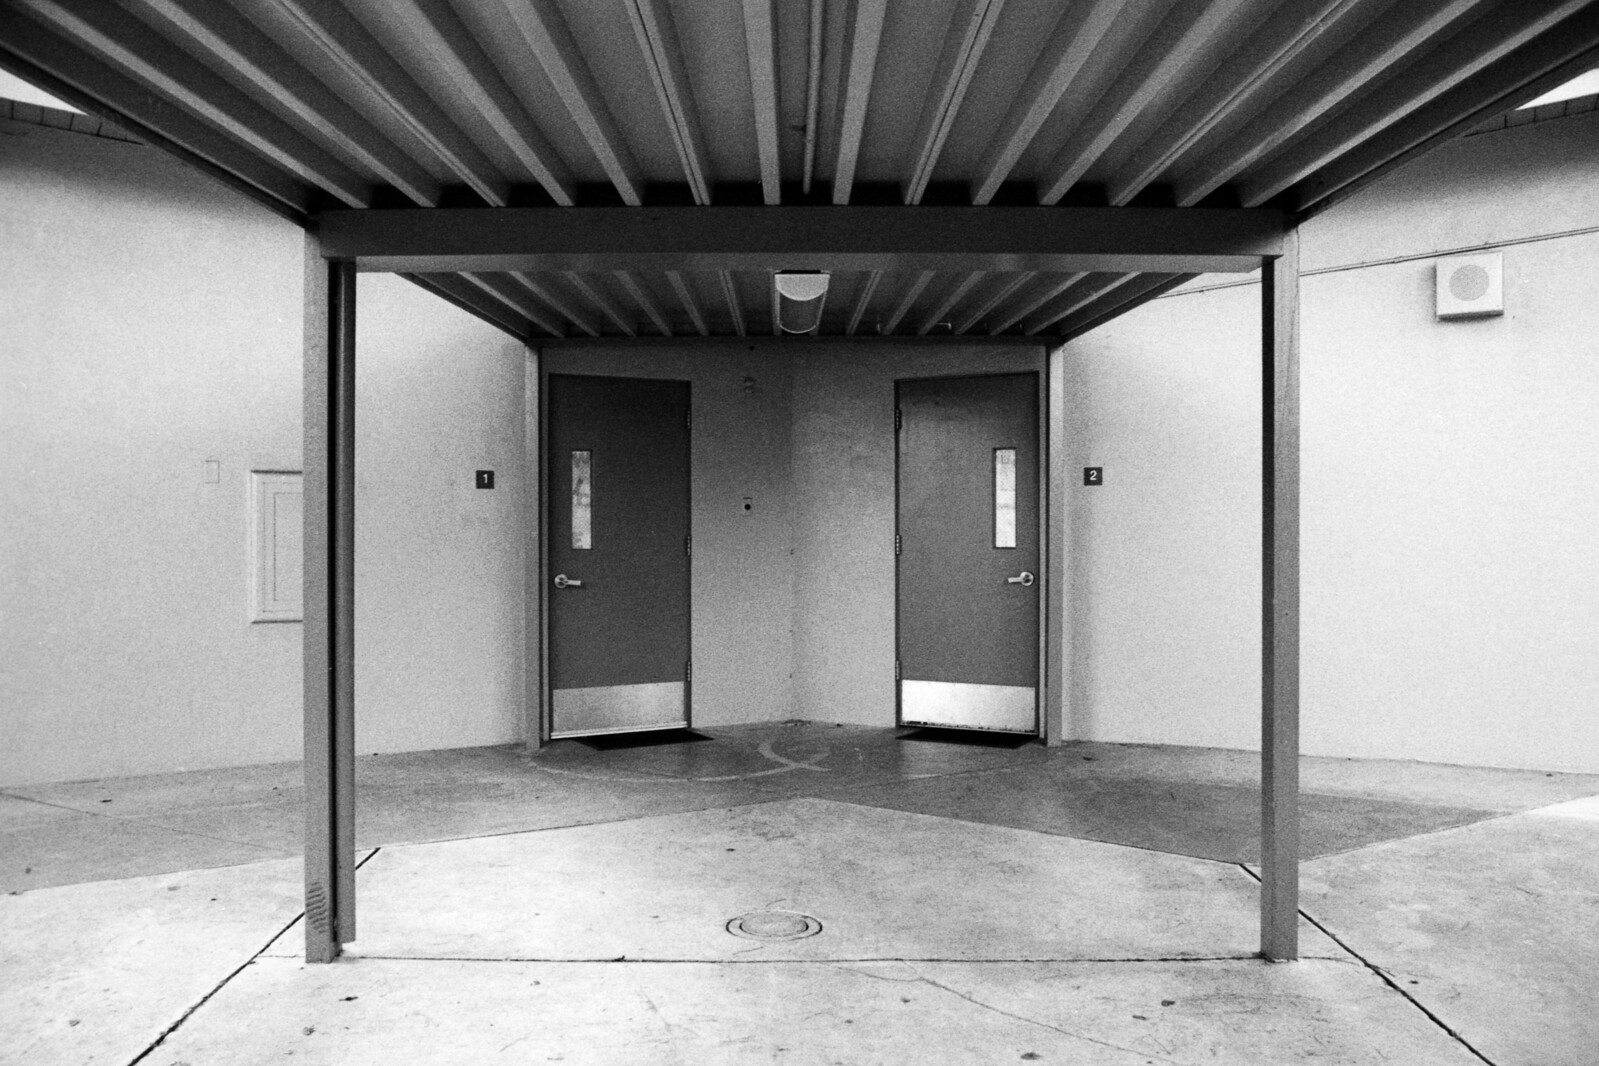 Corridor | by adrian_t